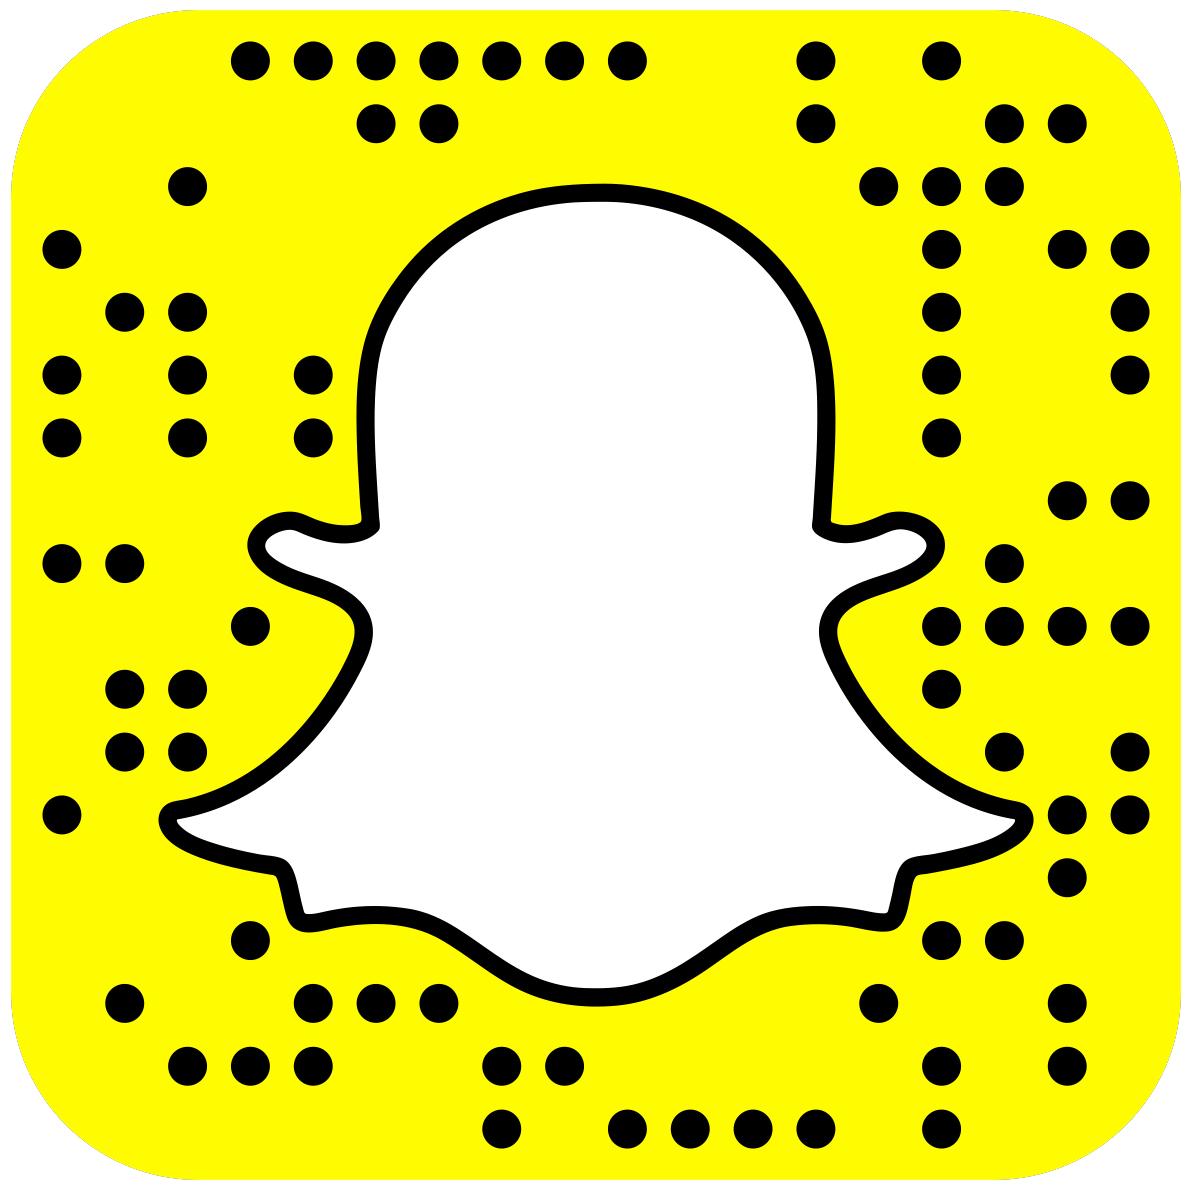 Willie Snead Snapchat username